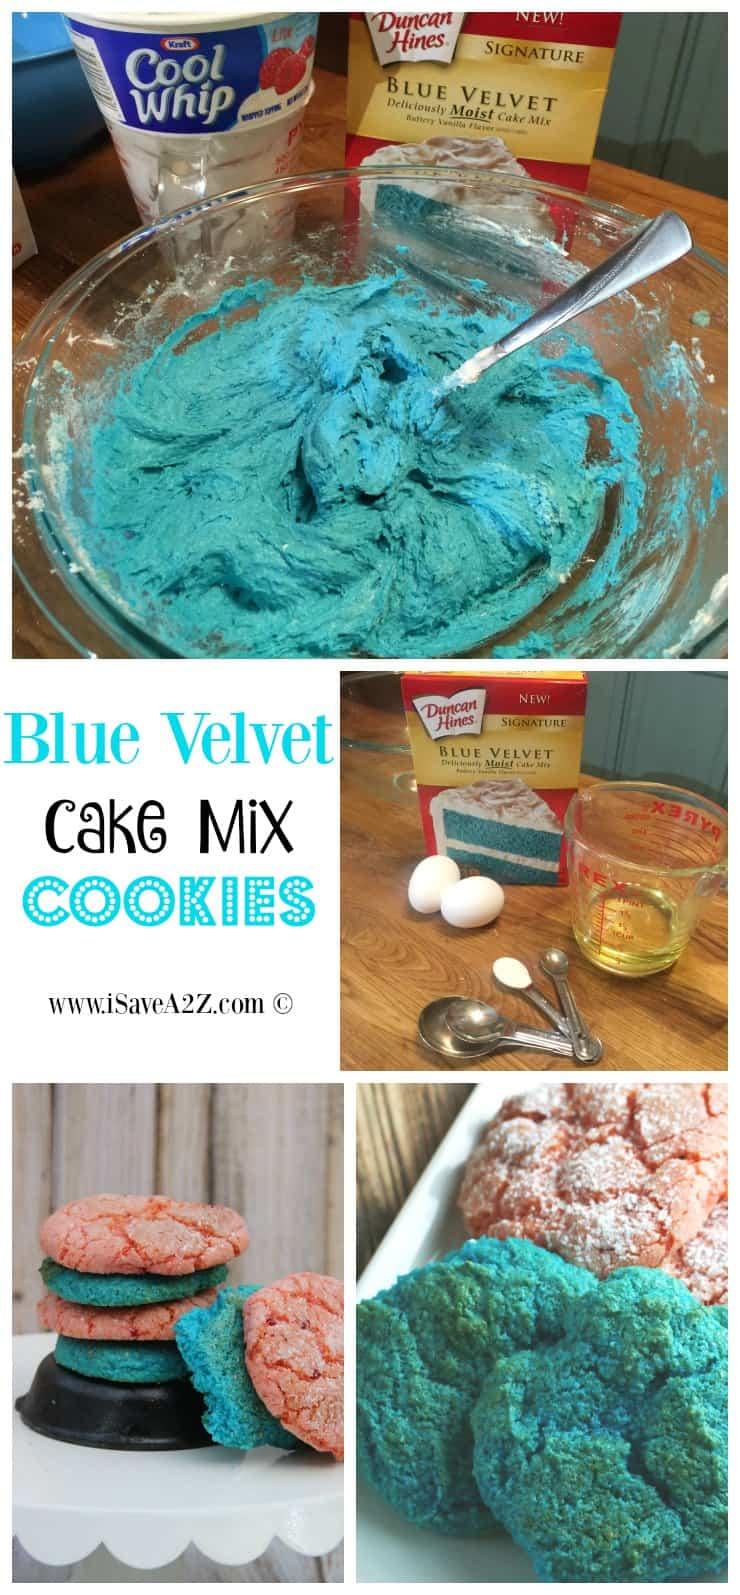 Blue Velvet Cake Mix Cookies Recipe